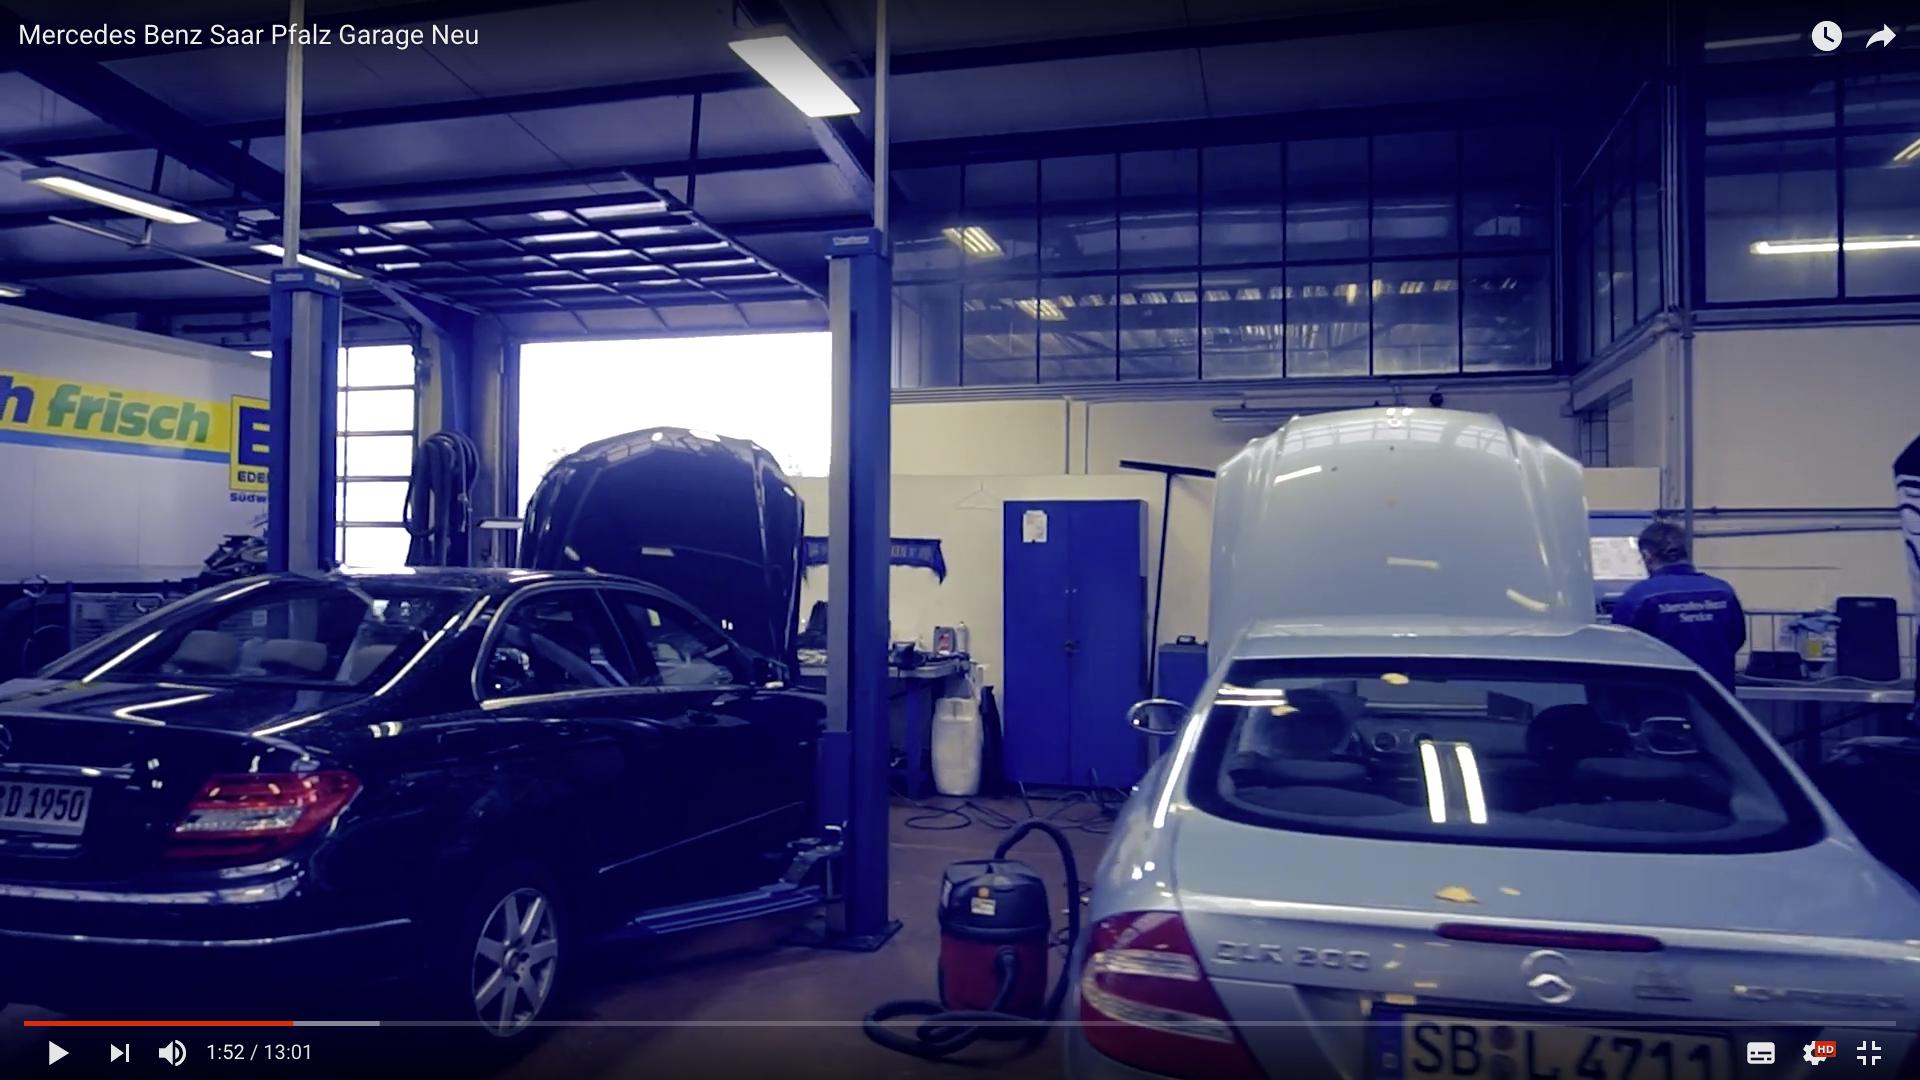 2017 Mercedes Benz Saar Pfalz Garage Neu Werkstatt _MSM_MEDIEN_SAAR_MOSEL_SAARLAND_FERNSEHEN_1_ED_SAAR